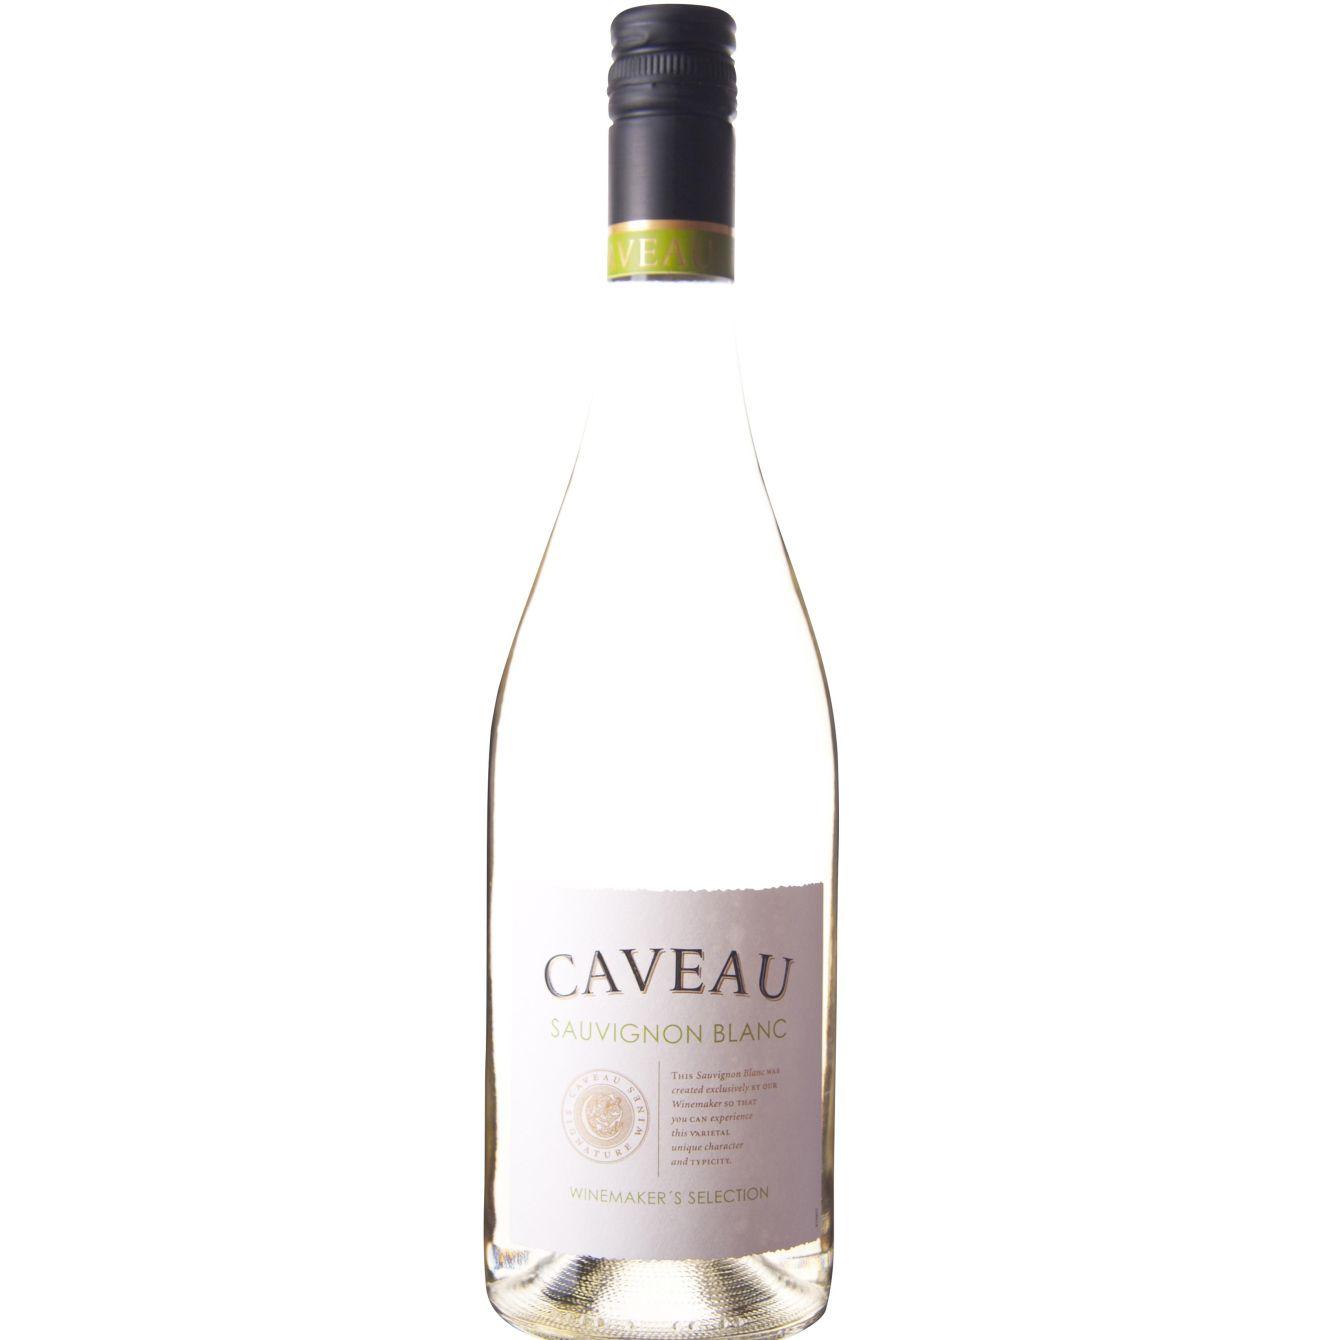 Caveau Sauvignon Blanc